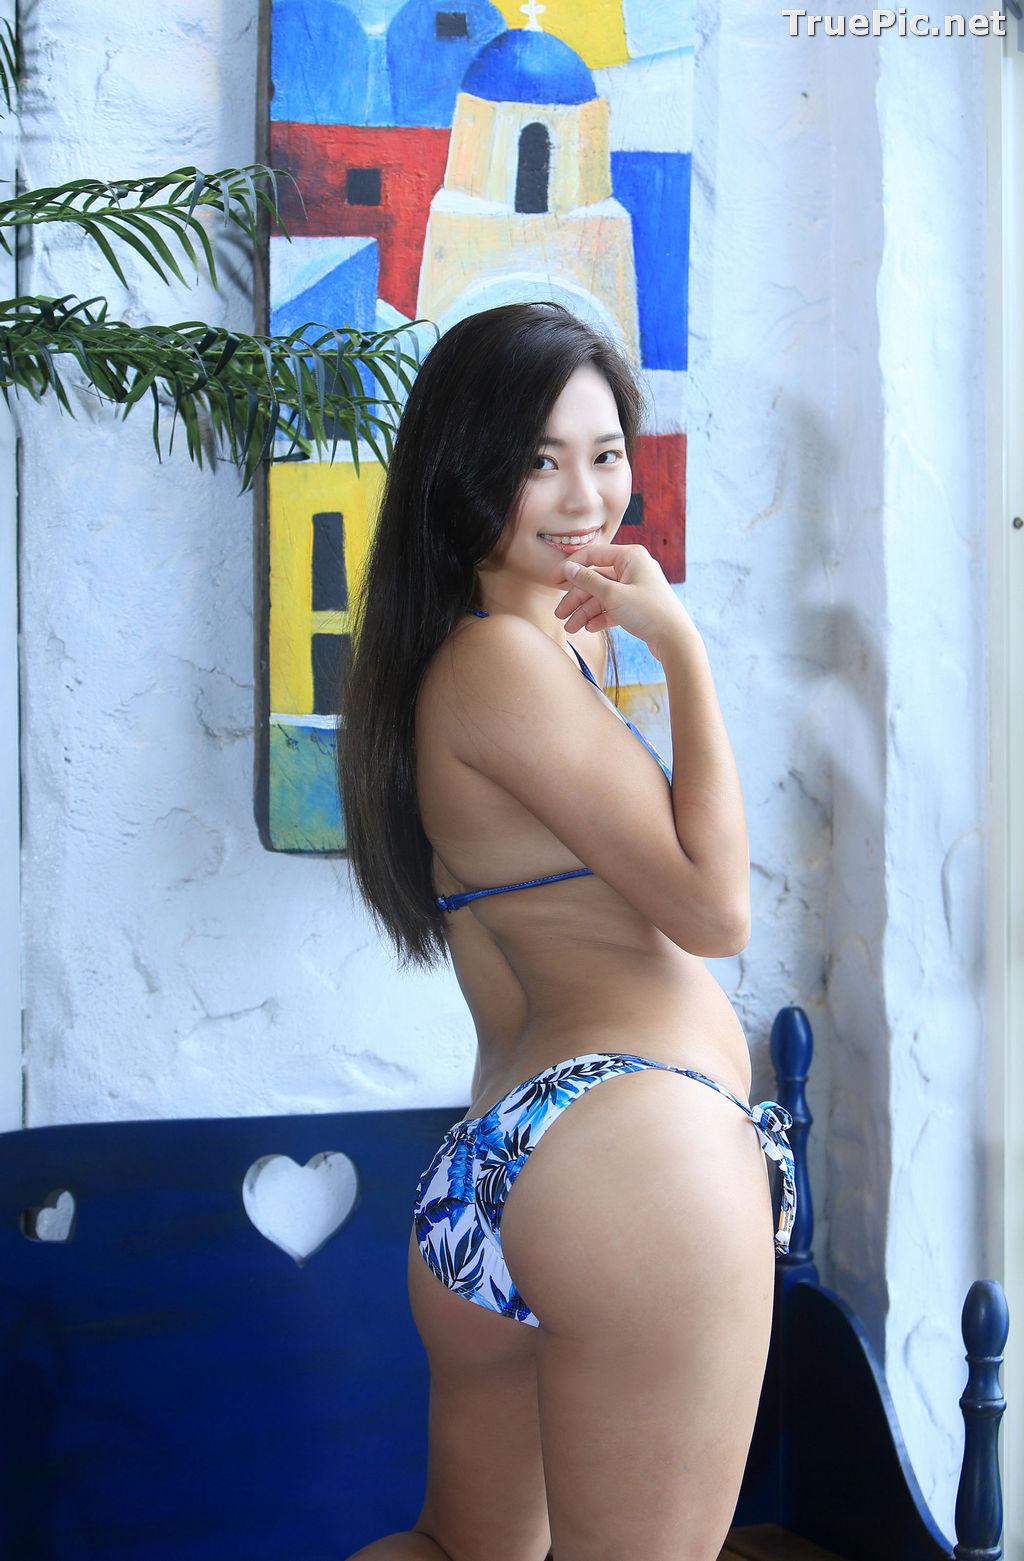 Image Taiwanese Model - Shelly - Beautiful Bodybuilding Bikini Girl - TruePic.net - Picture-32